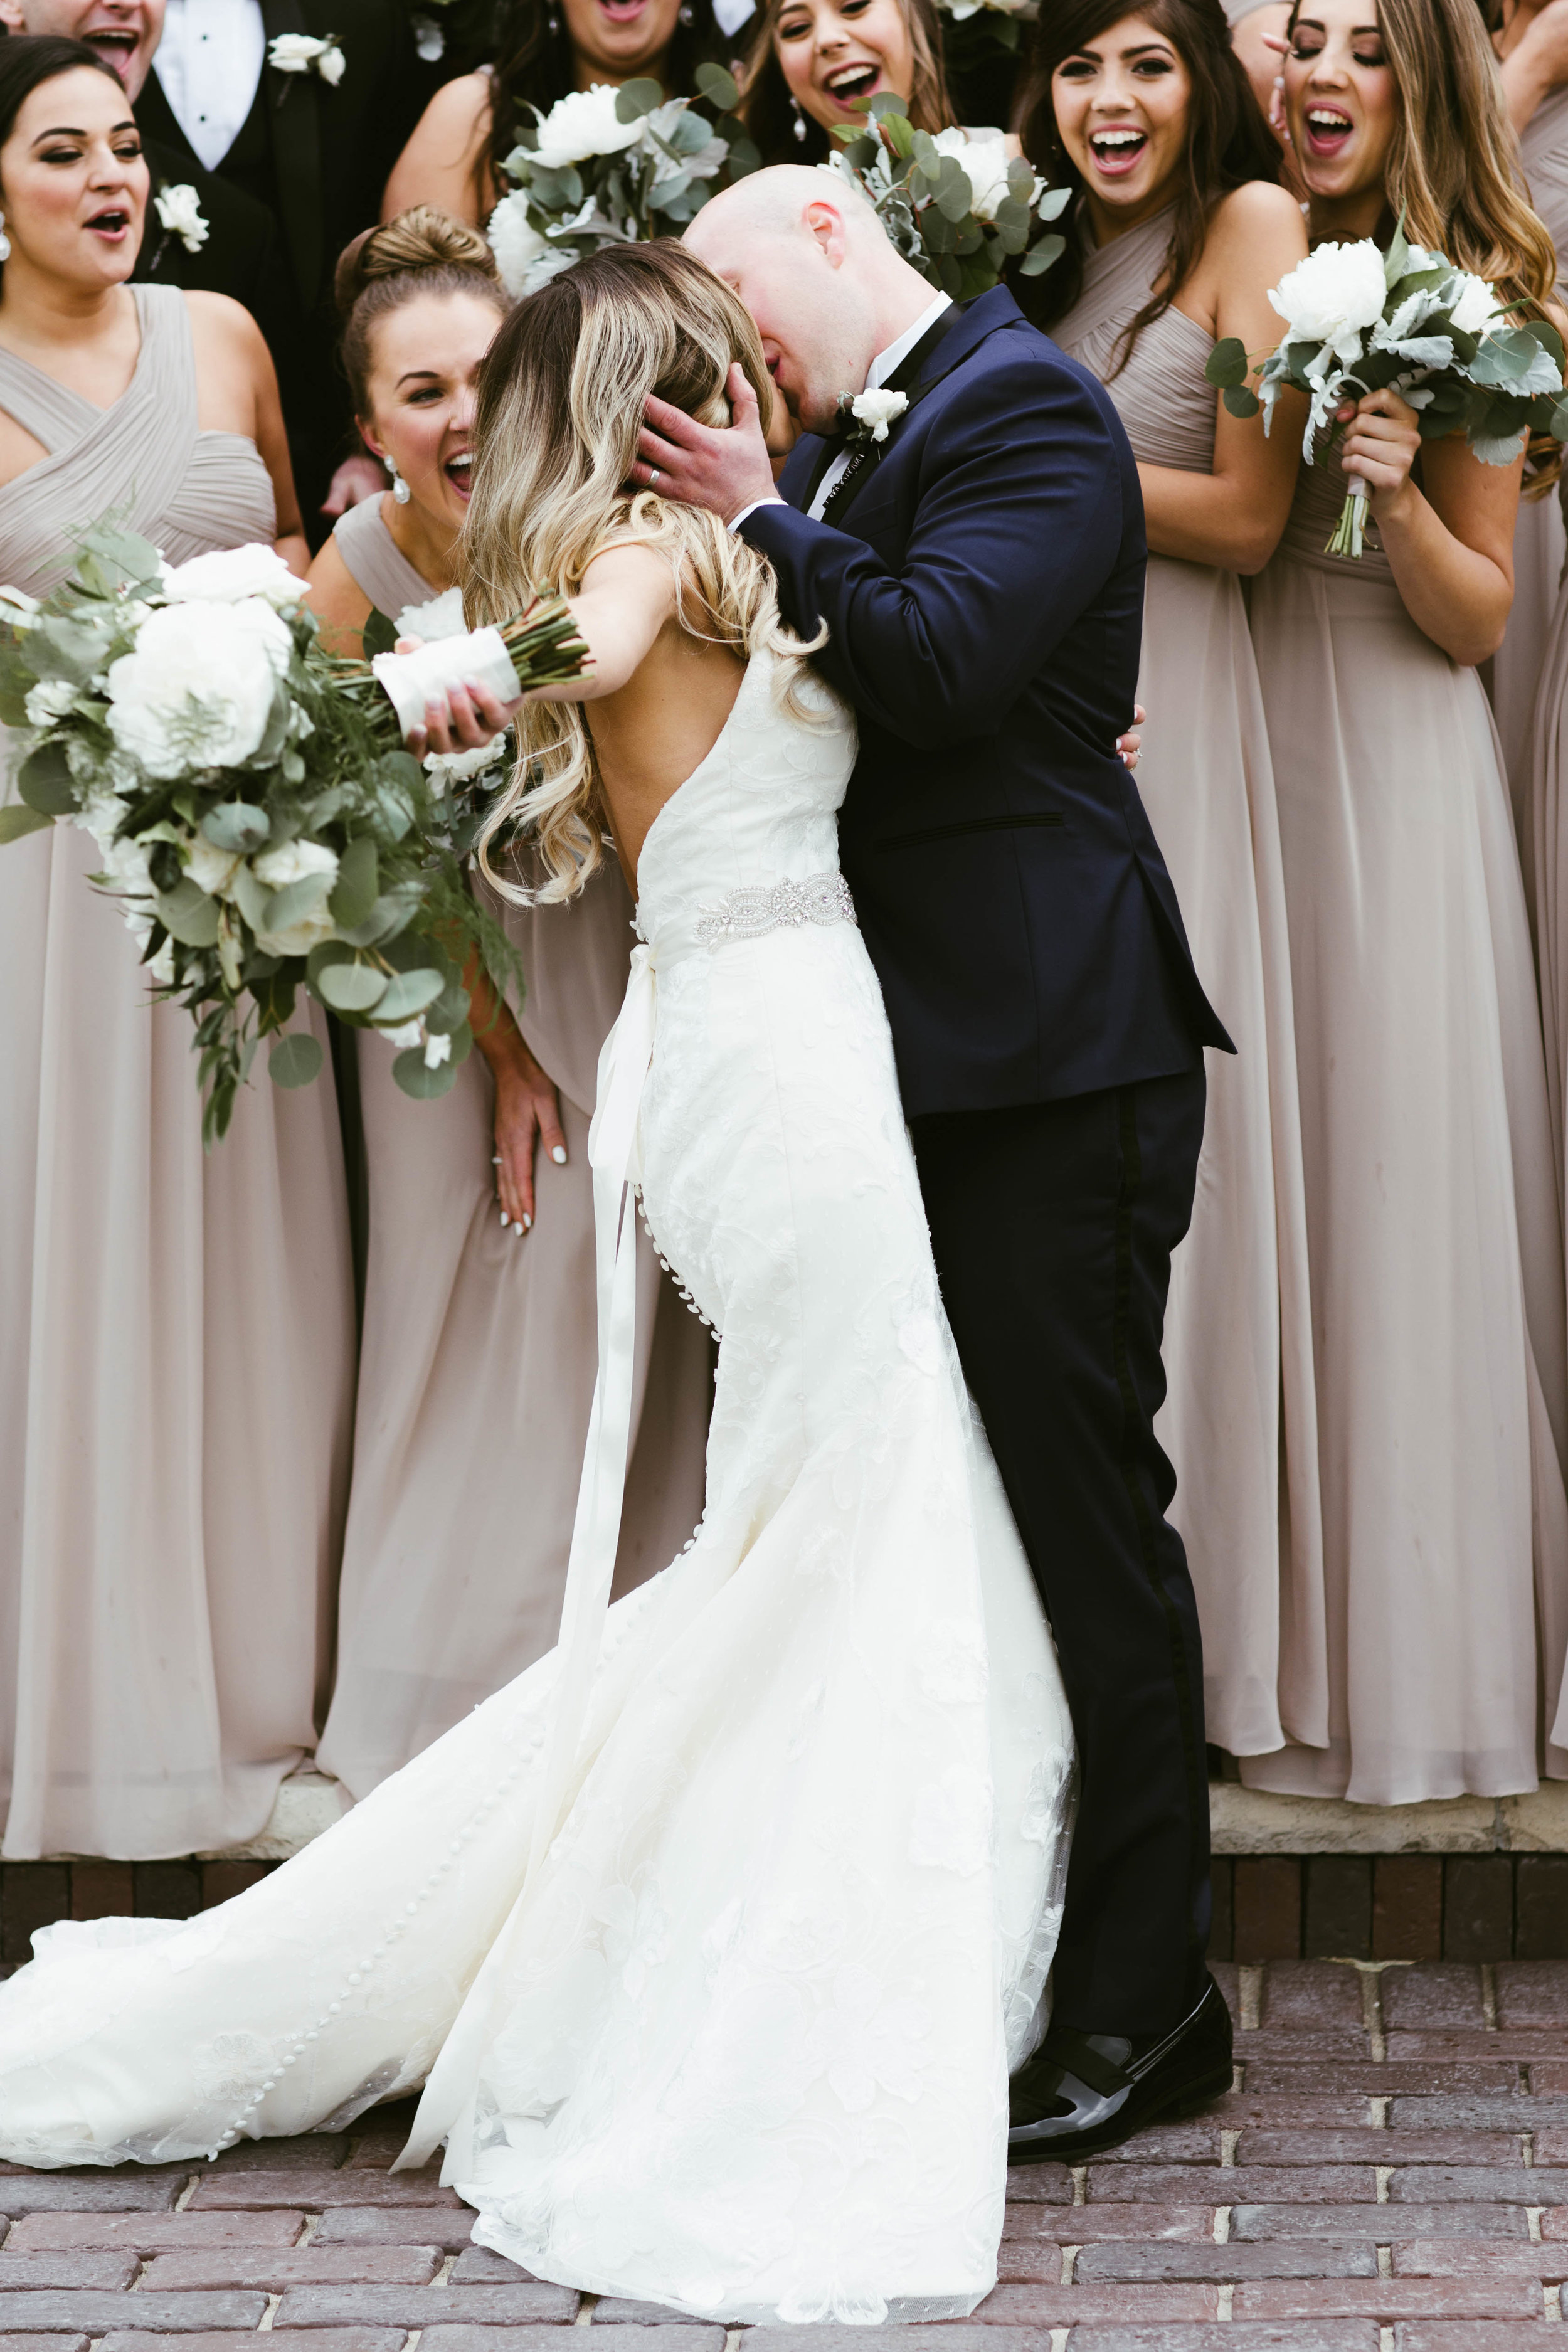 jennahazelphotography-wedding-portfolio-9570.jpg